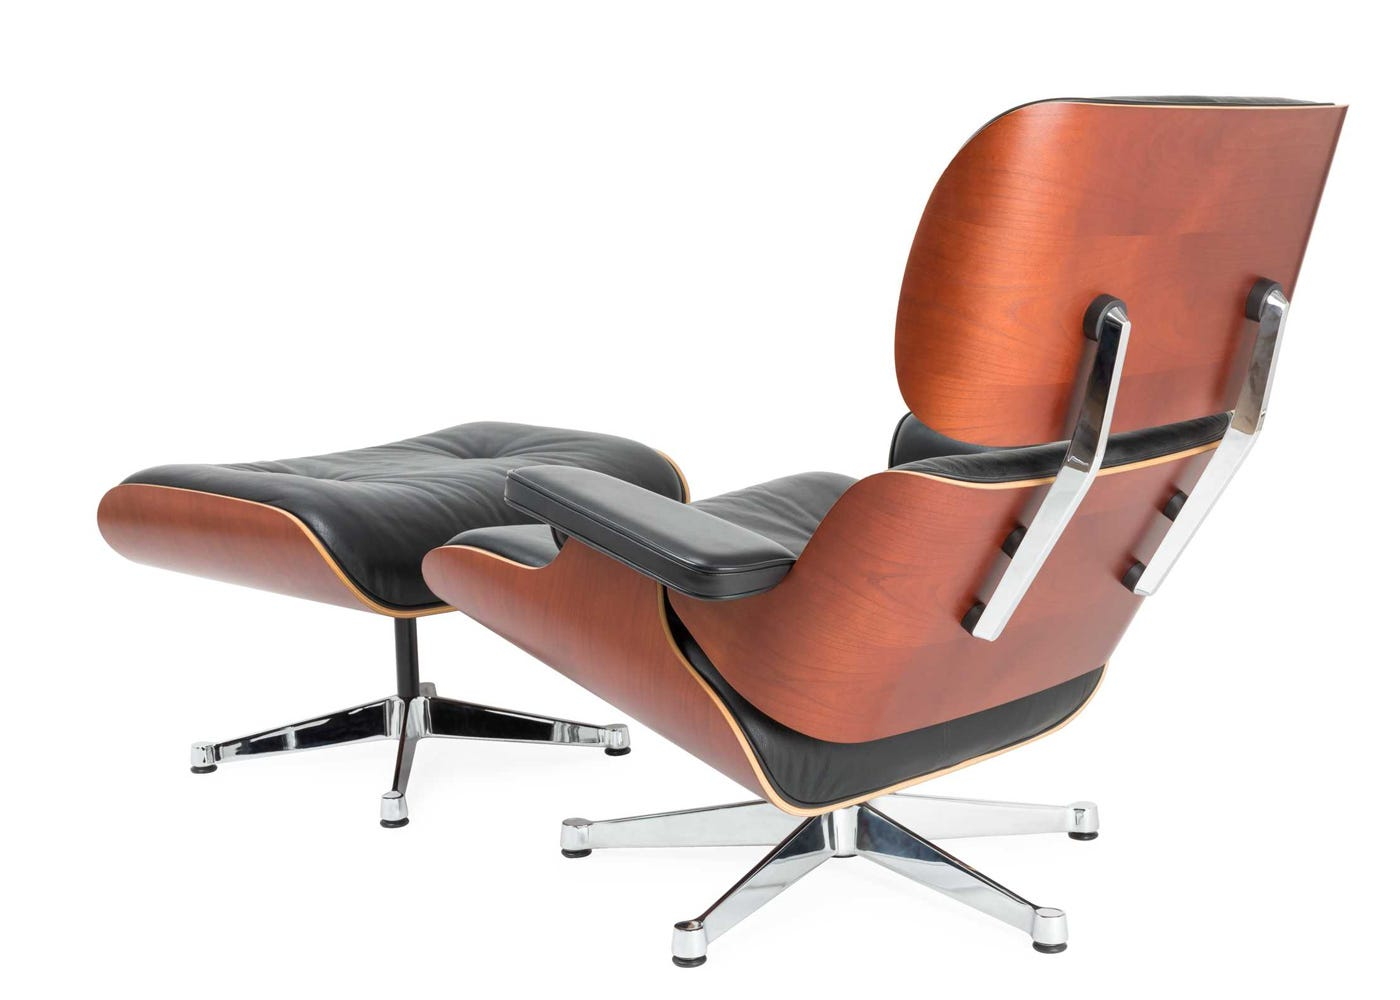 Launge Chair vitra eames lounge chair & ottoman (classic) black